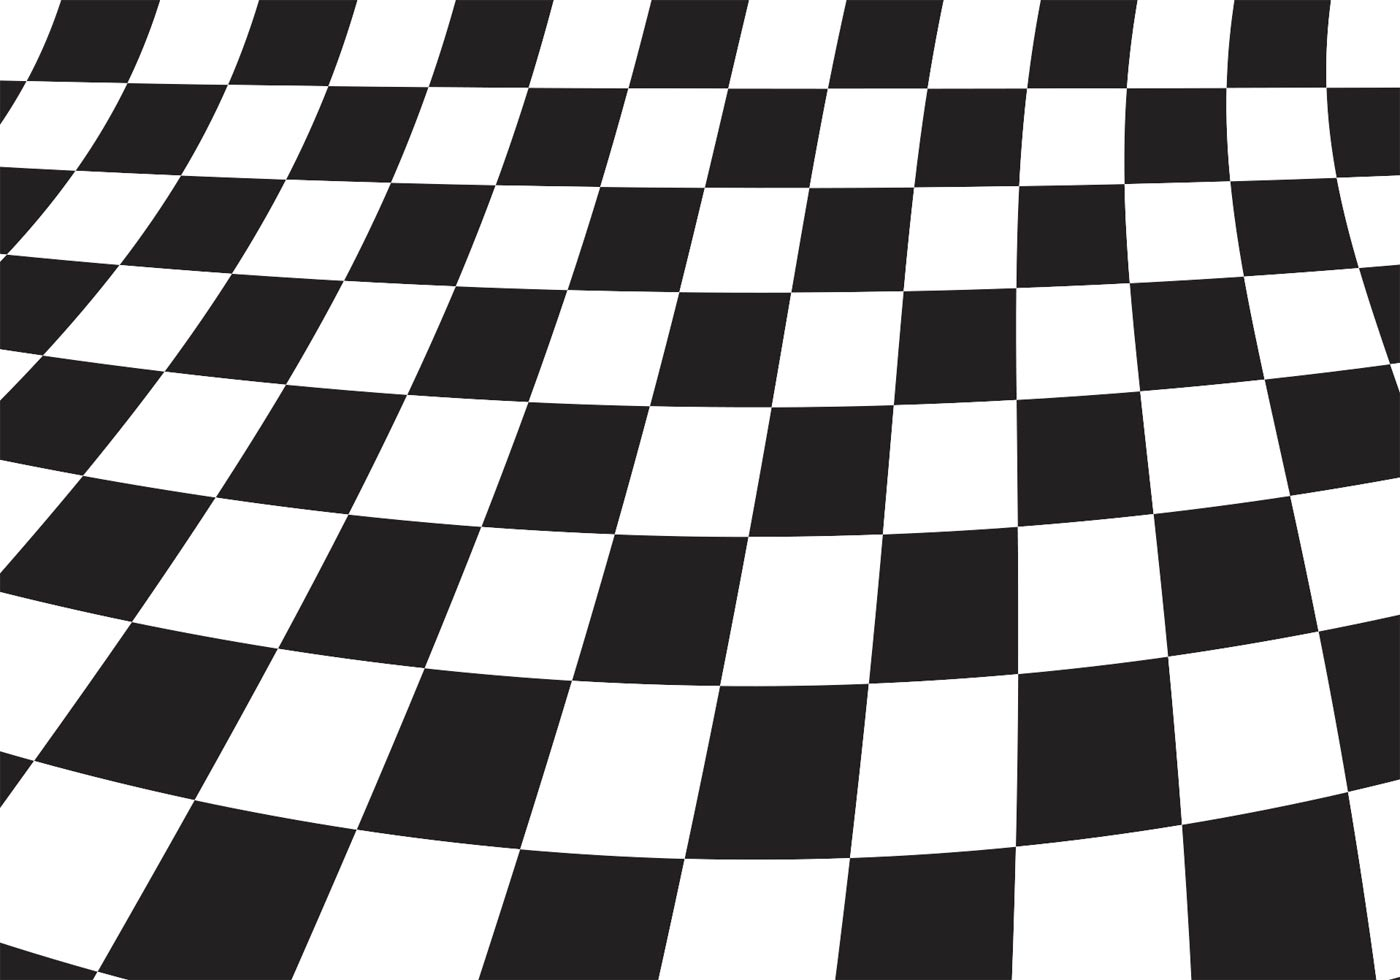 Checkered Design Checkerboard Pattern Download Free Vector Art Stock Graphics